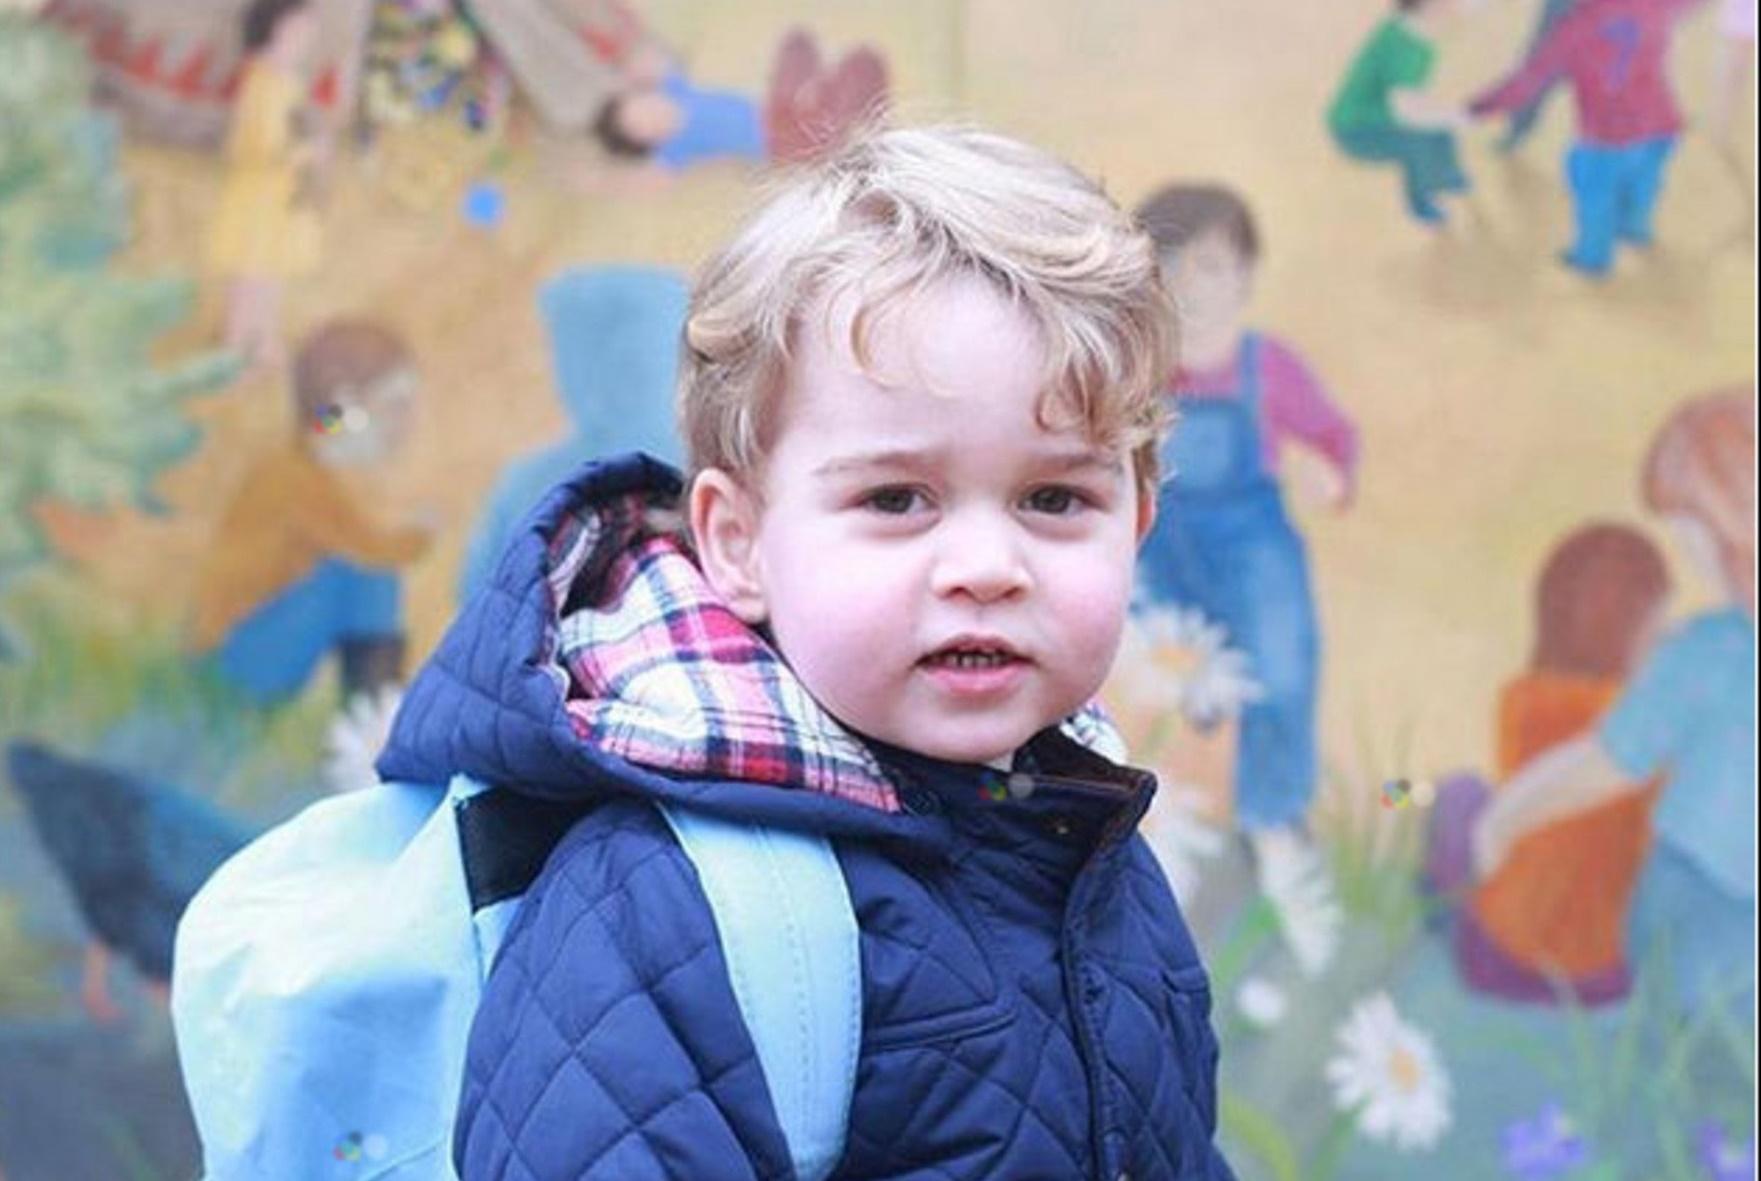 Принц Георг ипринцесса Шарлотта выдадут замуж тетю Пиппу